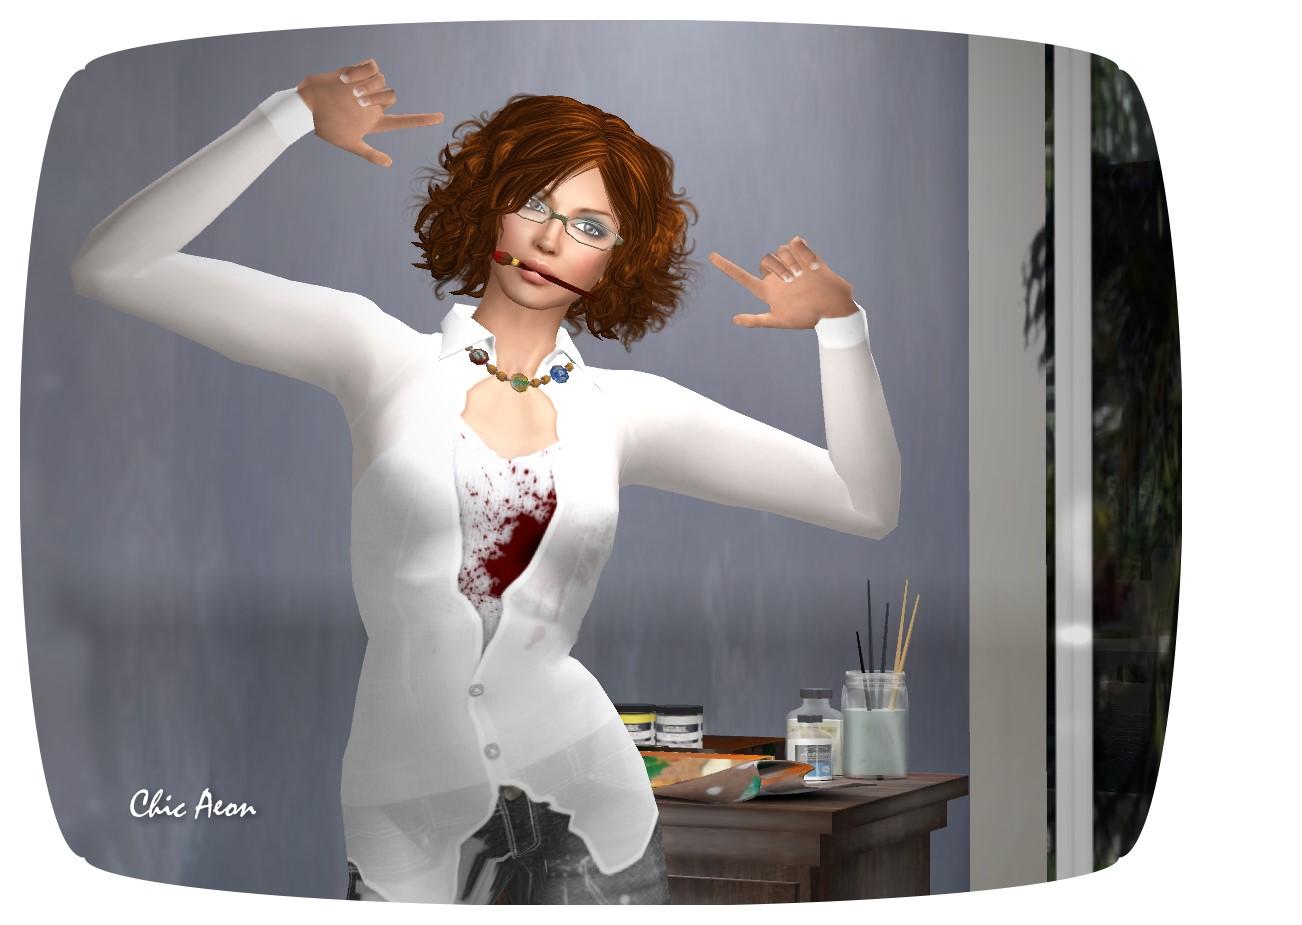 http://3.bp.blogspot.com/_ez10RUH4__U/TK9eK7pwssI/AAAAAAAAJlo/5unQj_fpGG8/s1600/painterdeco.jpg